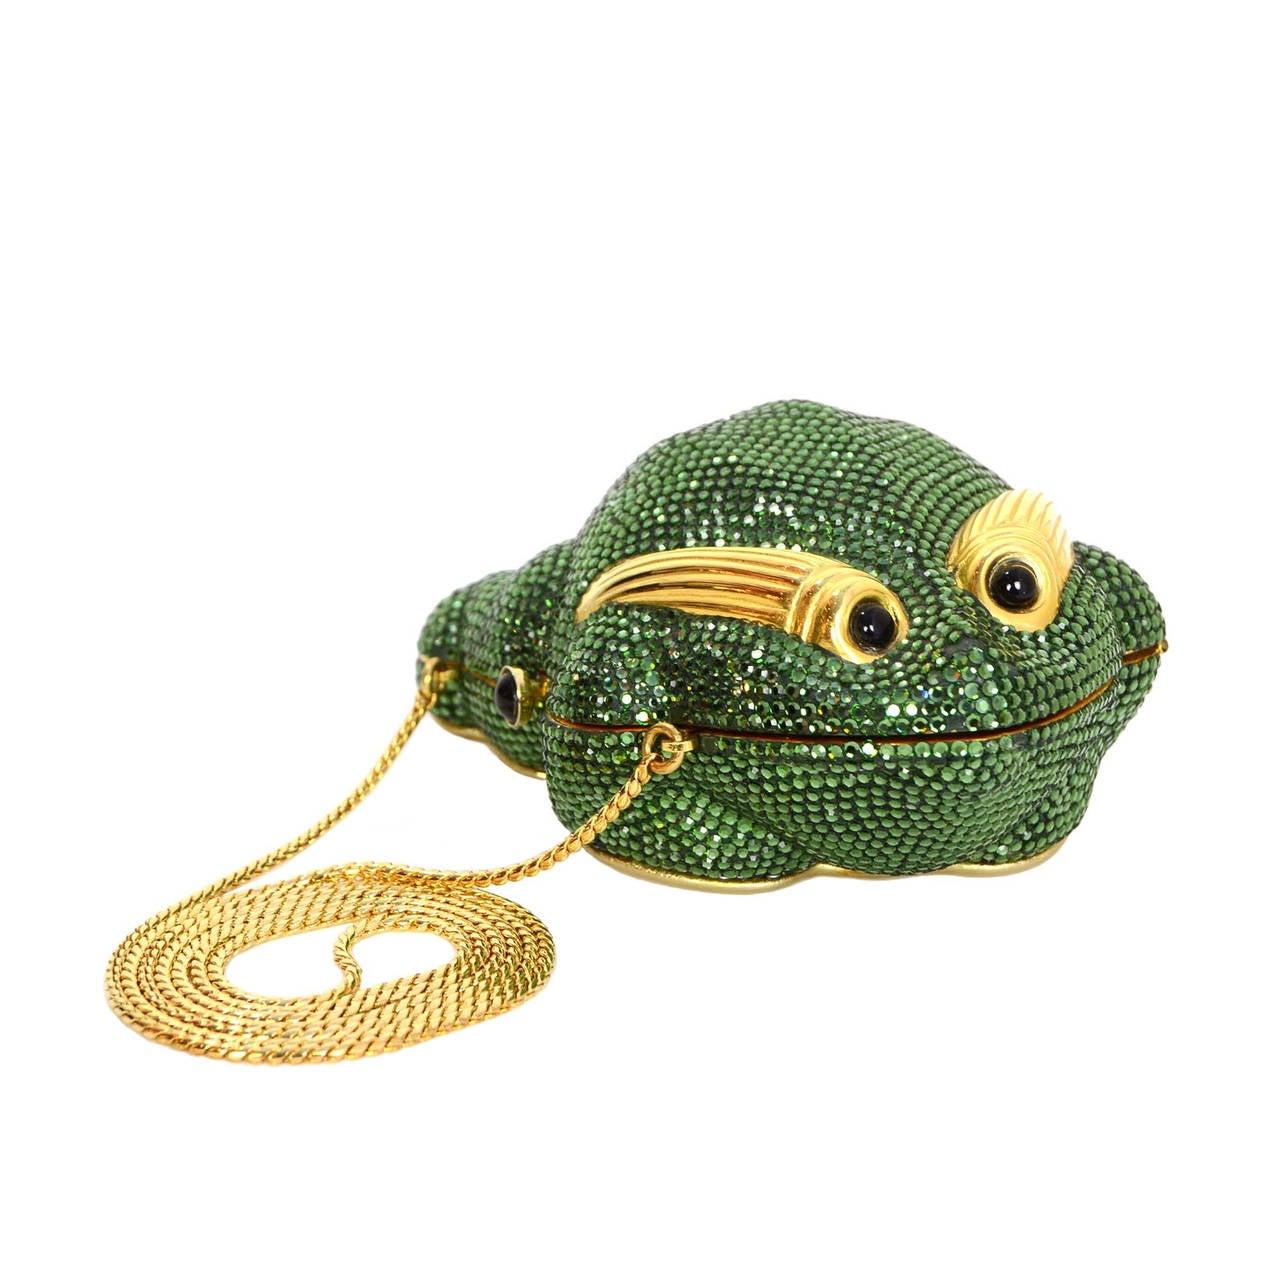 Judith Leiber Green Crystal Frog Minaudiere Bag GHW 1